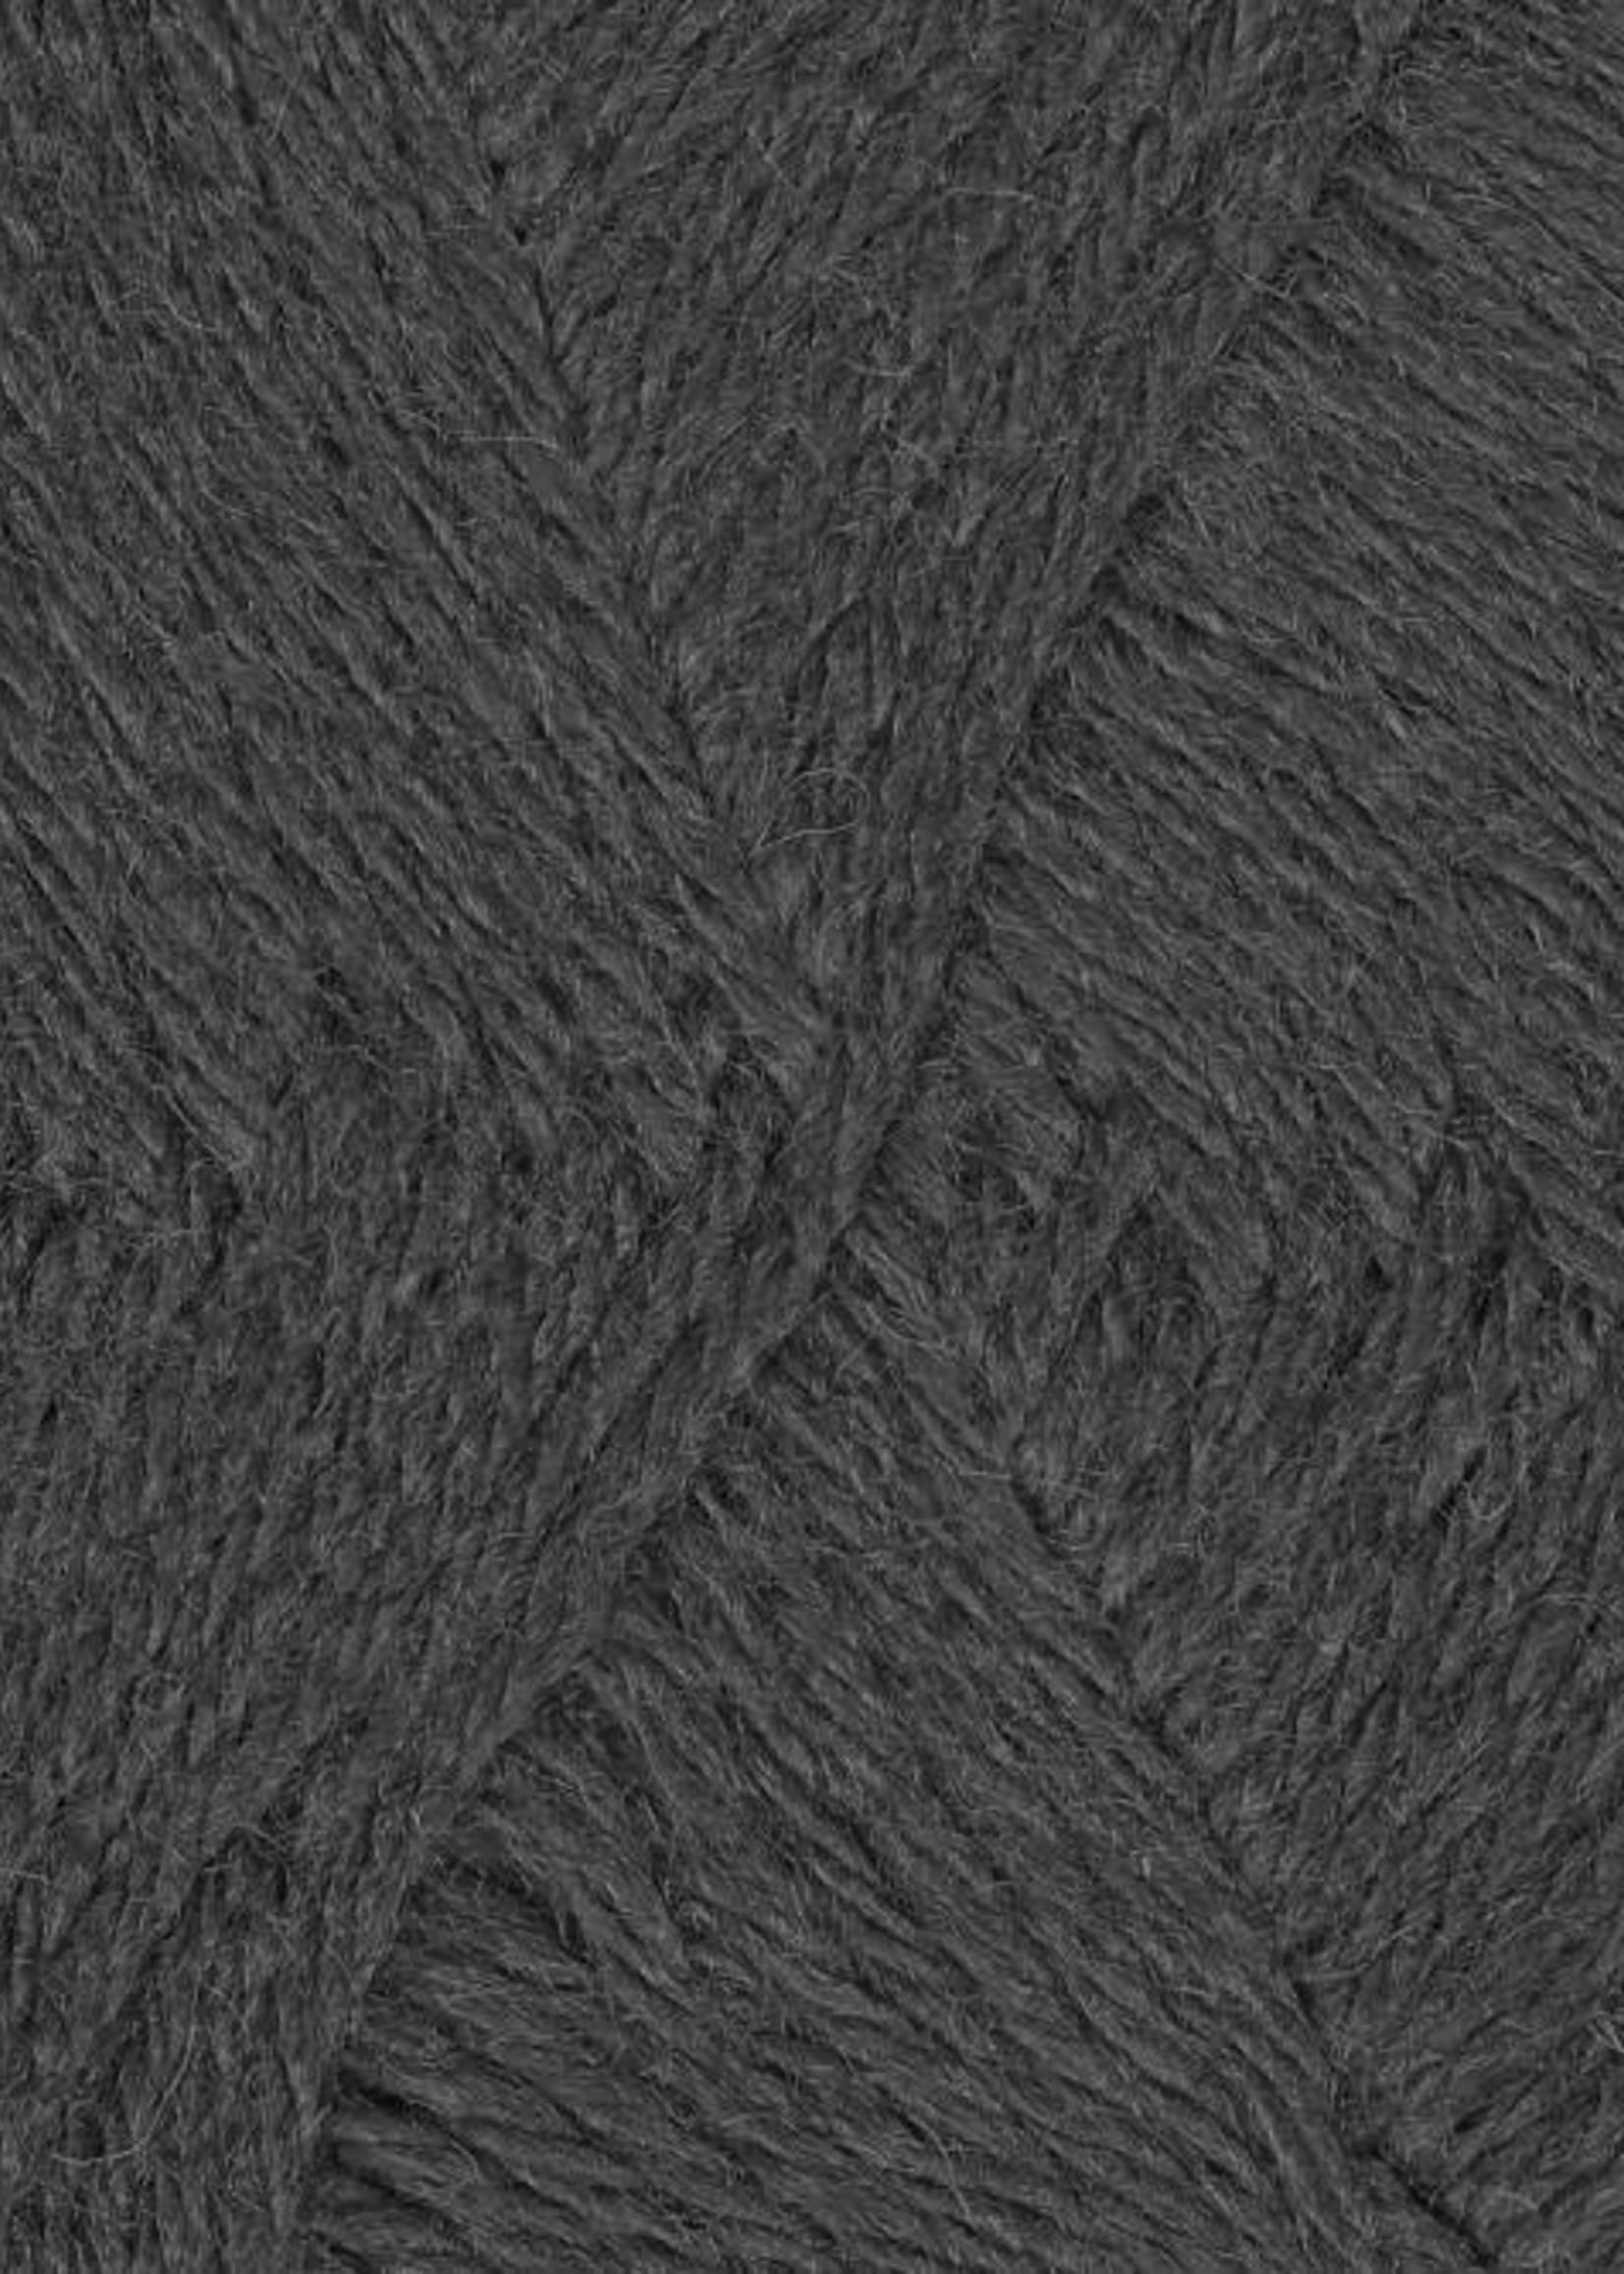 Knitting Fever KFI Collection Teenie Weenie Wool - Jet